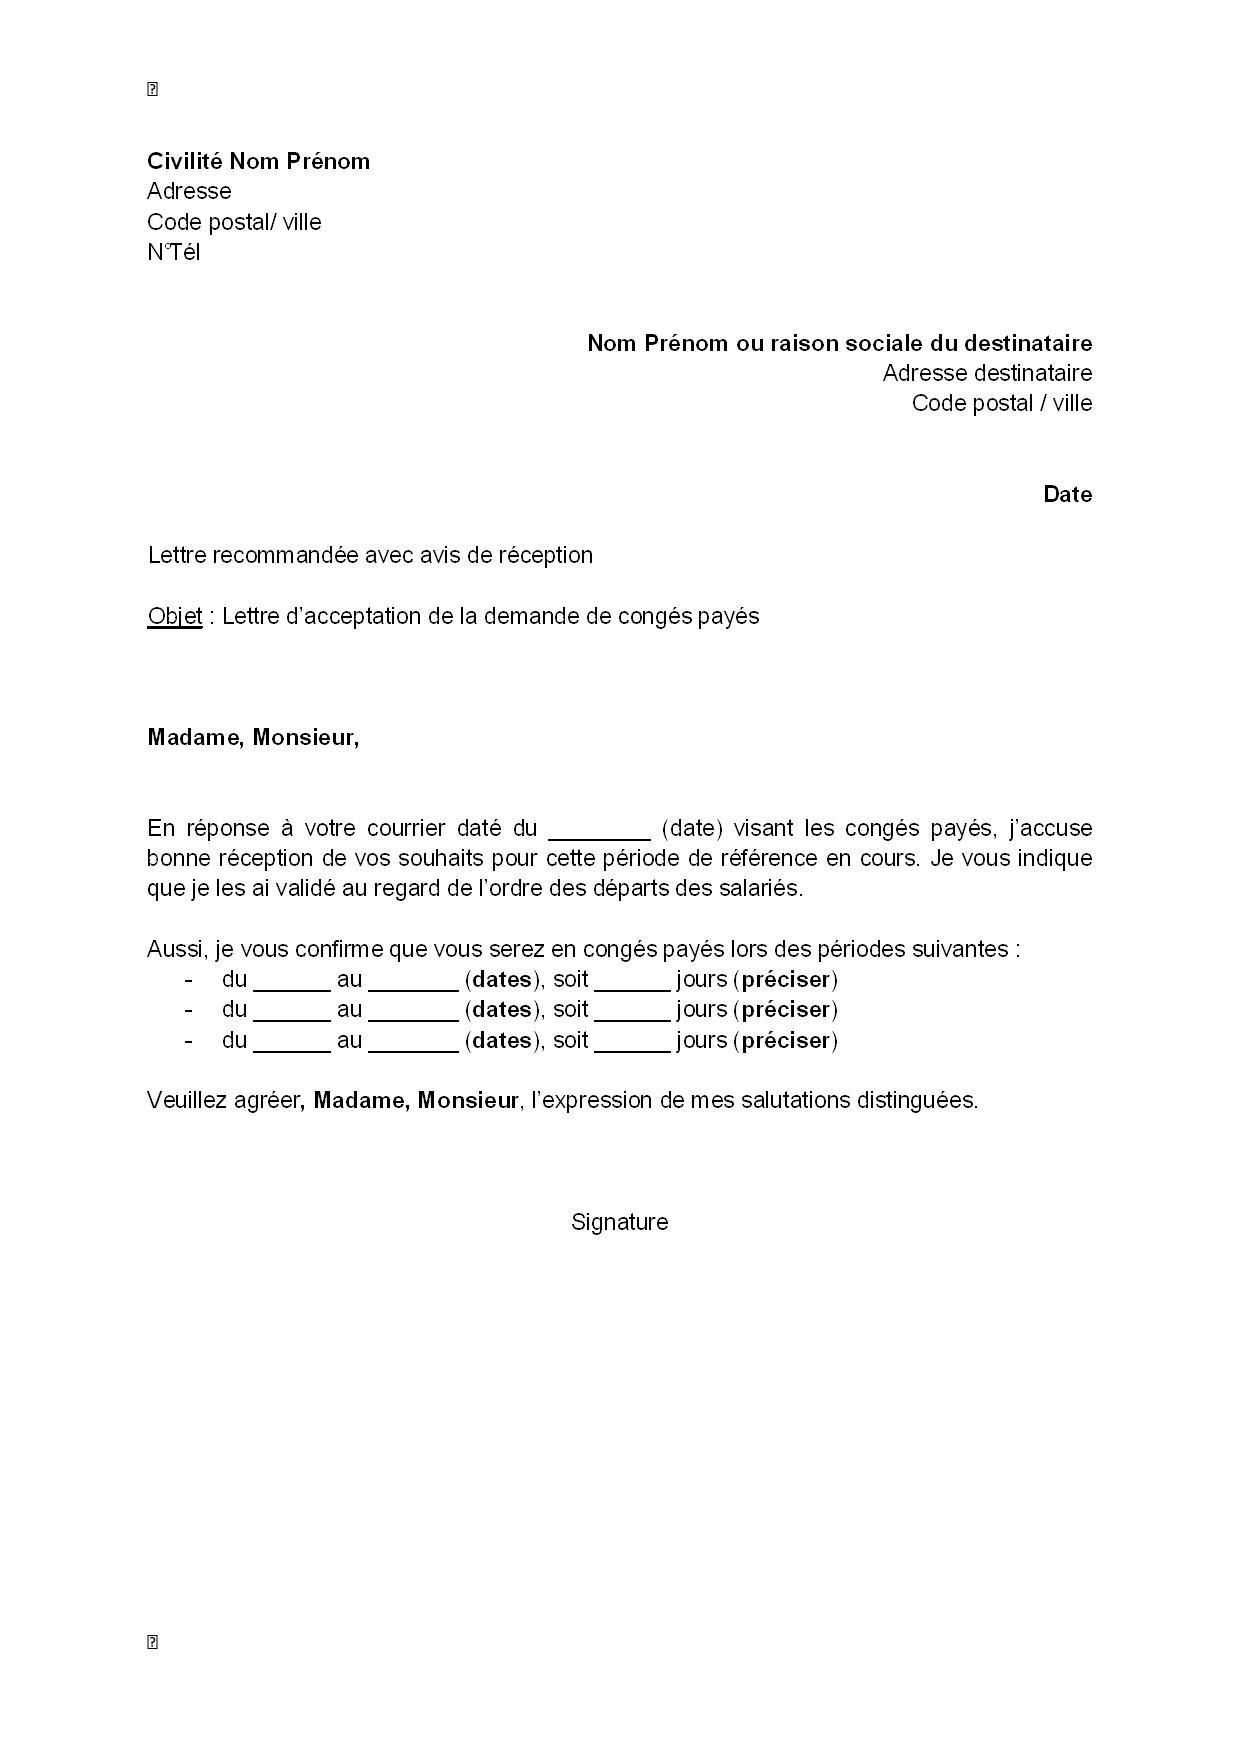 lettre d u0026 39 acceptation  de l u0026 39 employeur  de la demande de